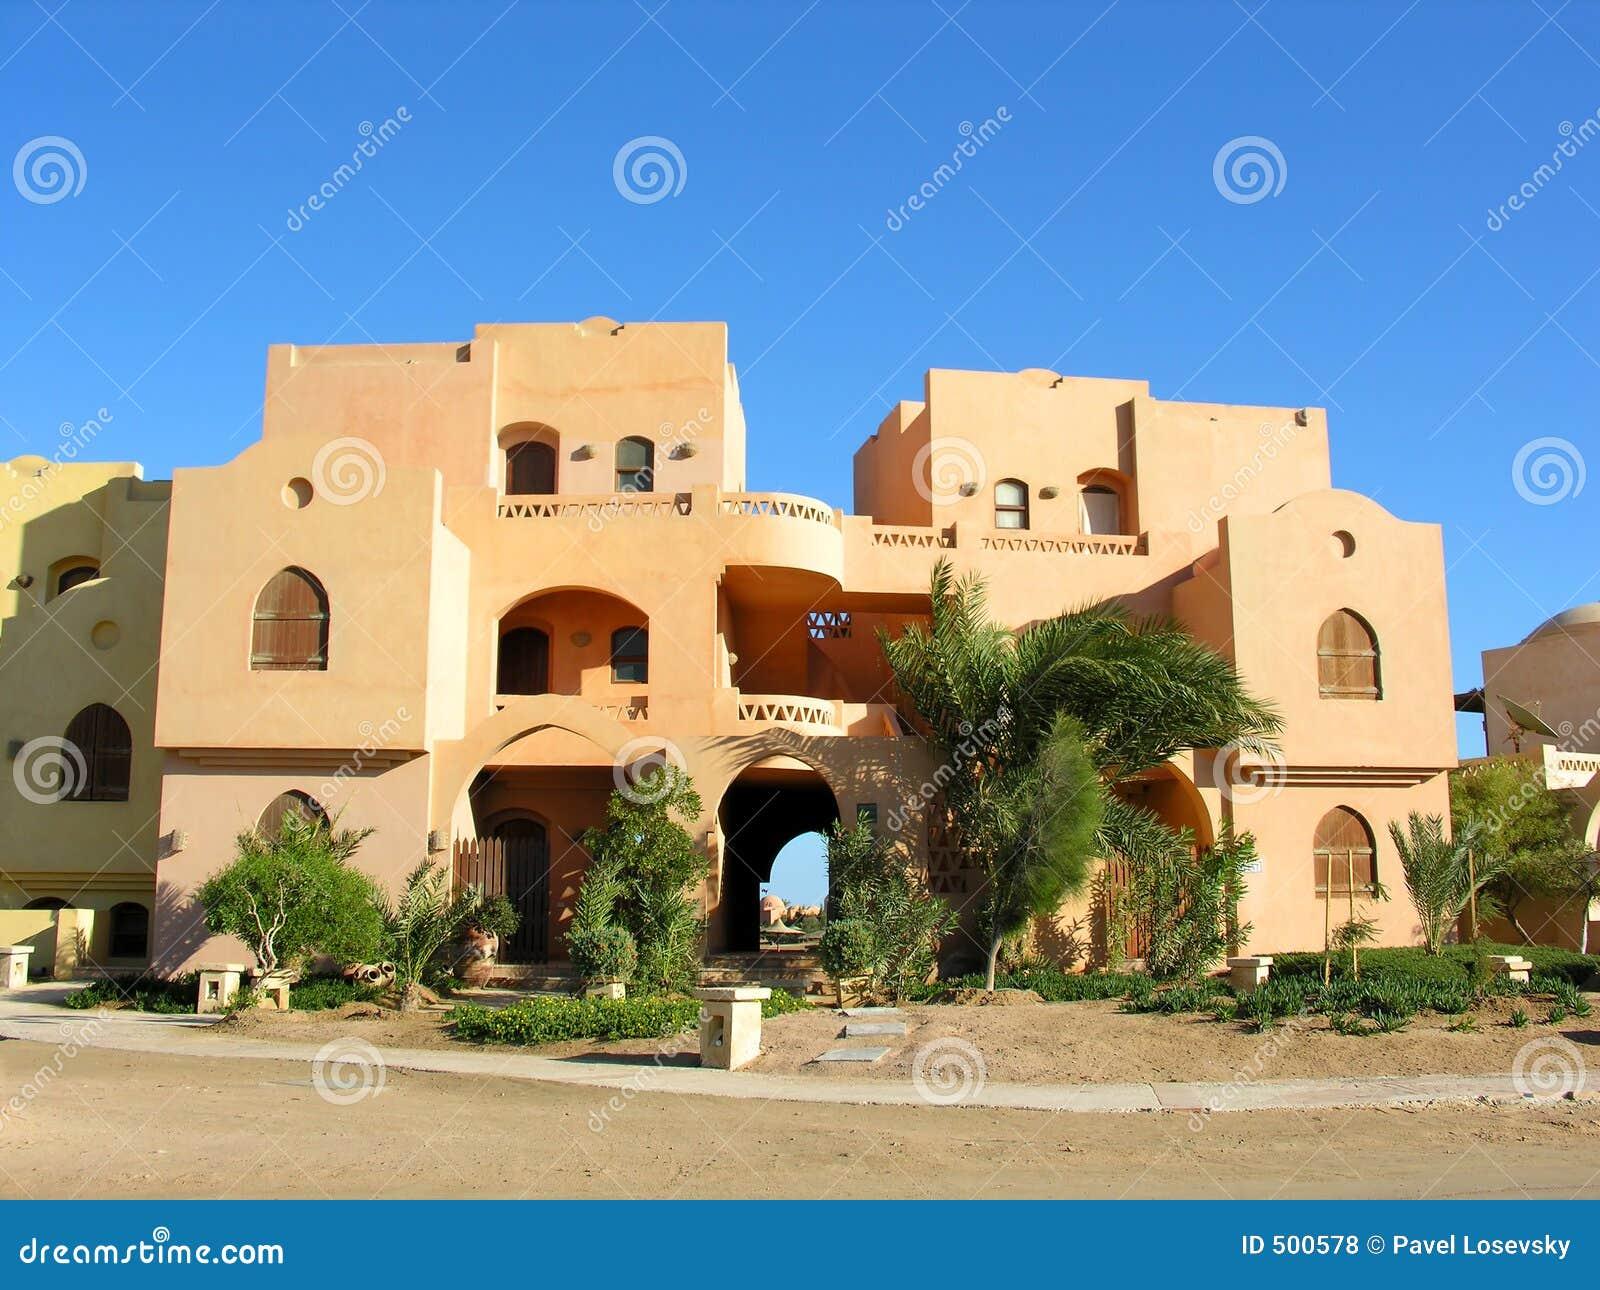 Htel La Maison Arabe, Marrakech